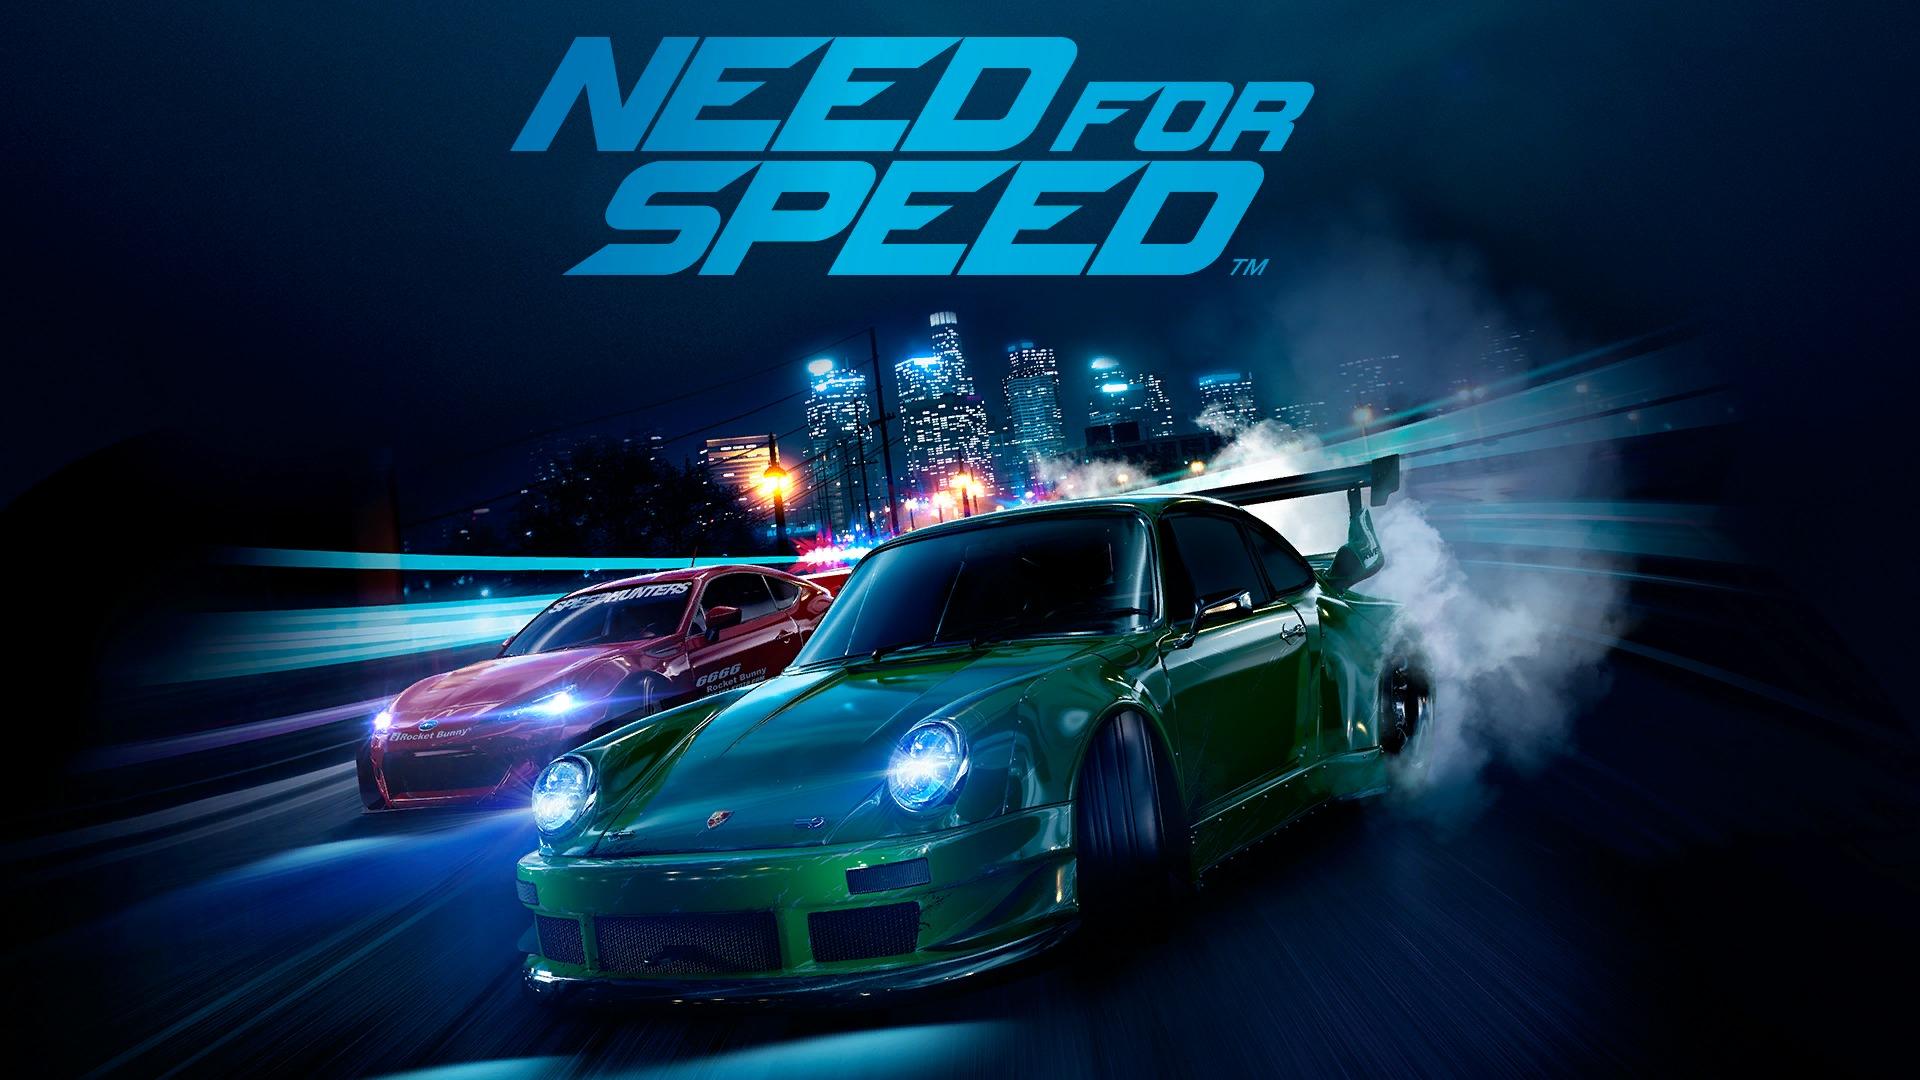 Free Download Need For Speed Green Porsche Race Desktop Wallpaper